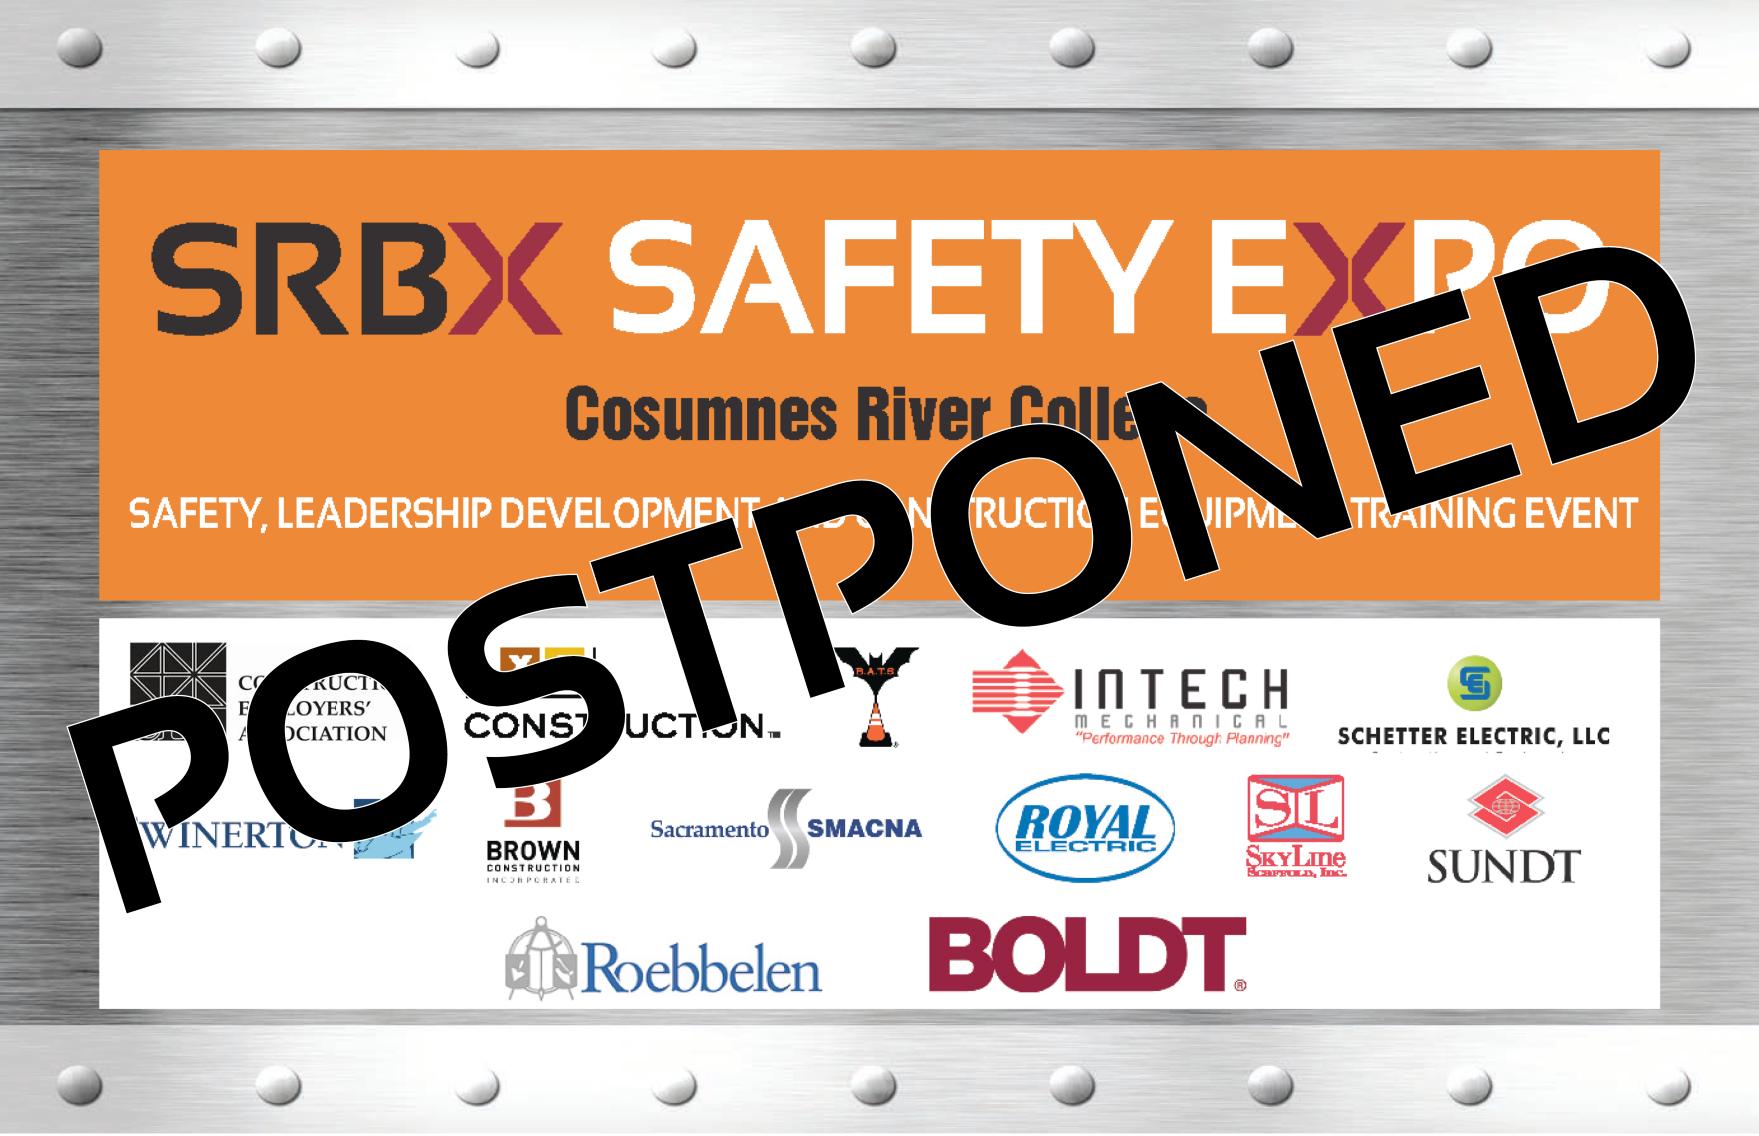 2020 SRBX Safety Expo